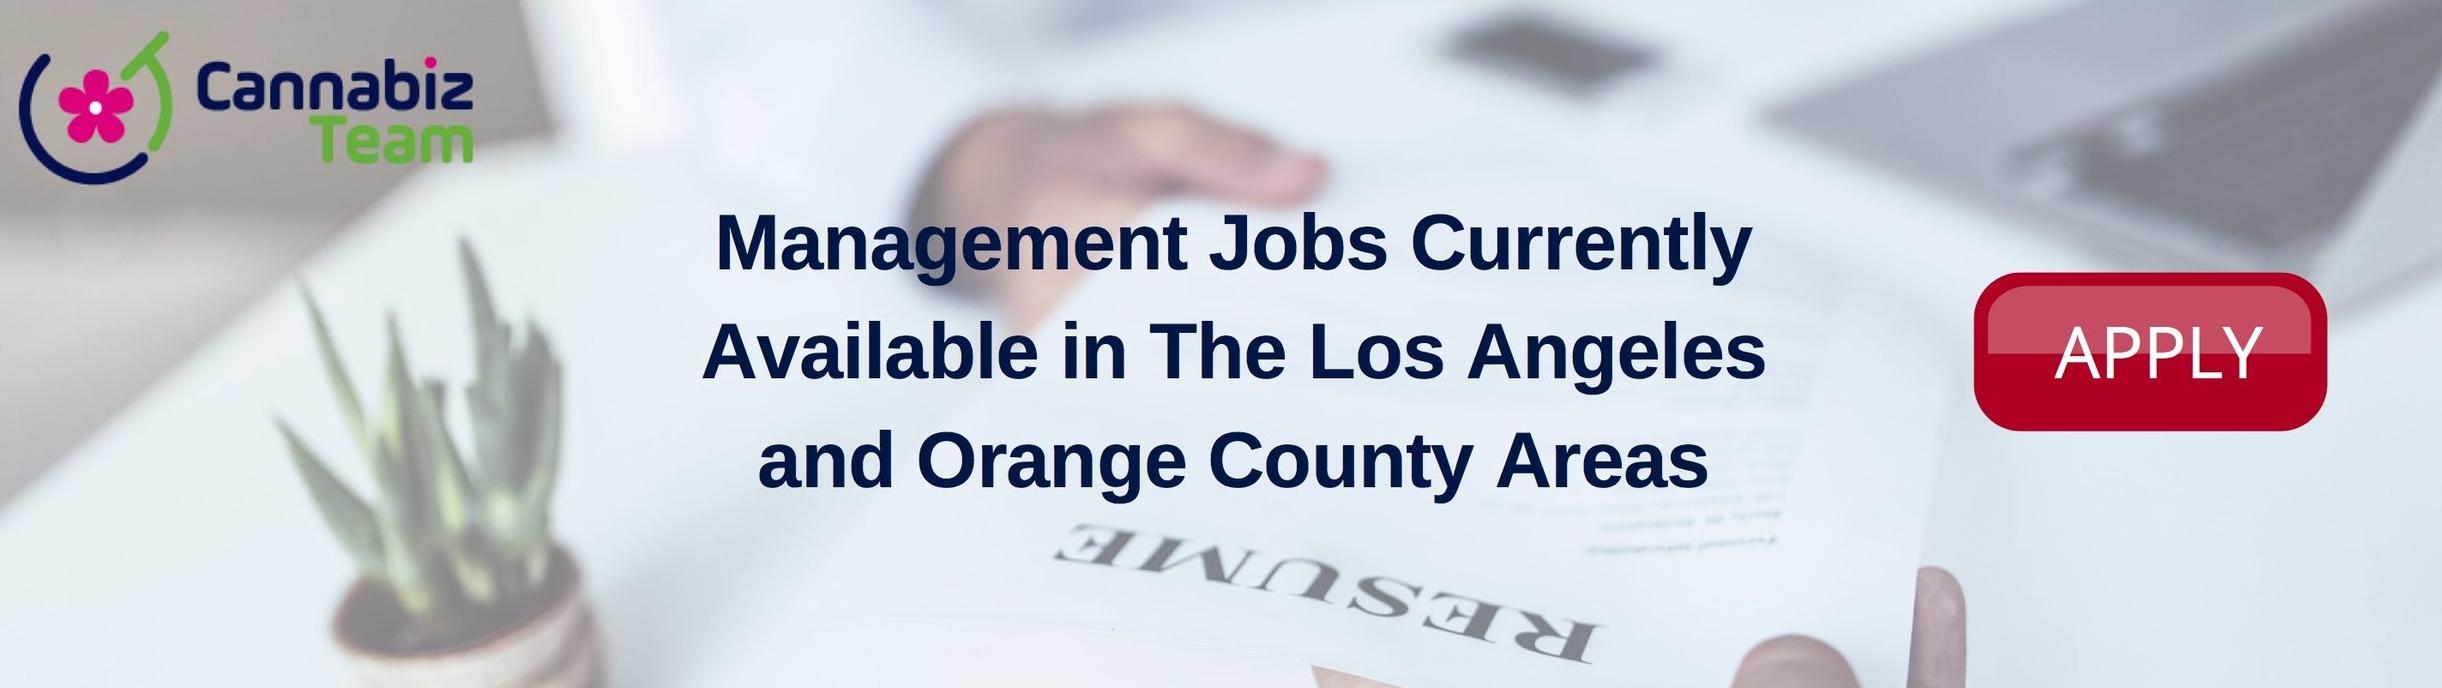 Management Jobs Apply Banner.jpg